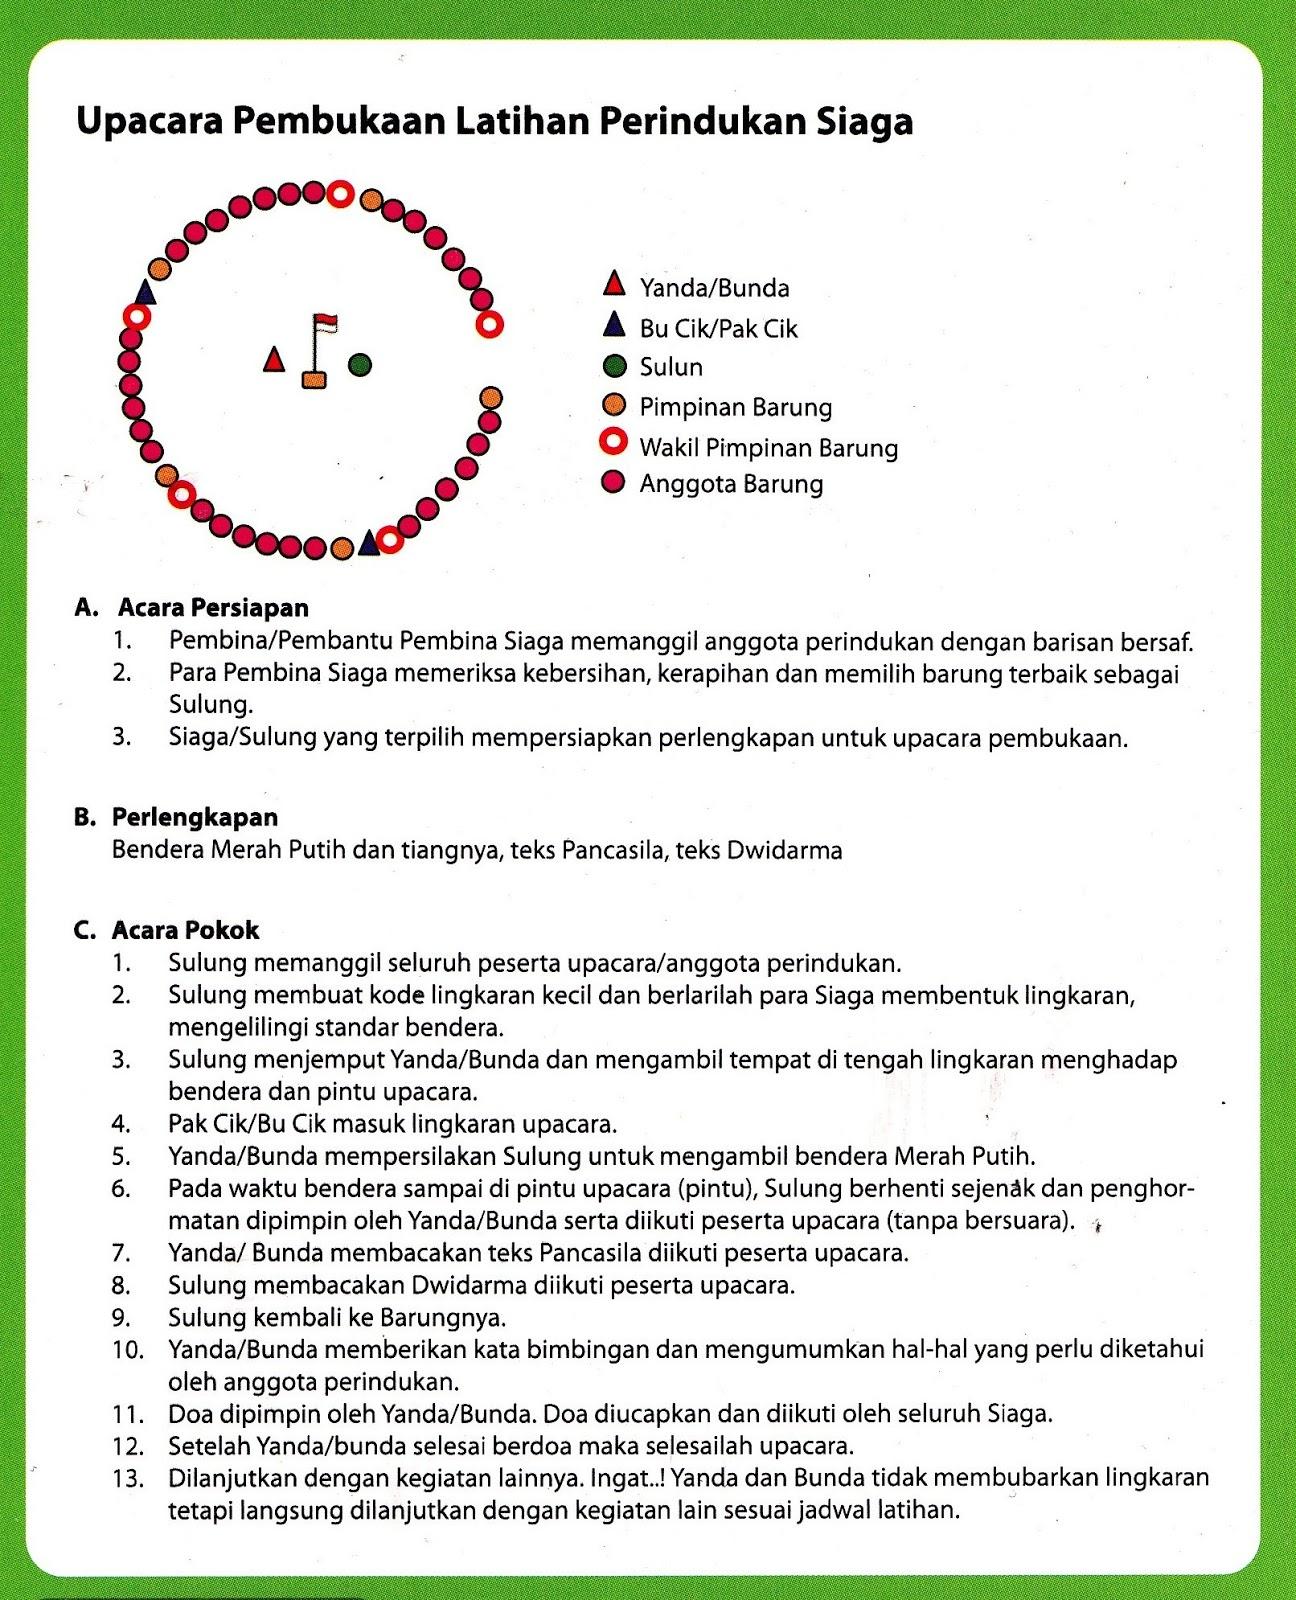 Upacara Pembukaan Latihan Siaga : upacara, pembukaan, latihan, siaga, Upacara, Pramuka, Tingkat, Siaga, Lengkap, Kwarran, Seorang